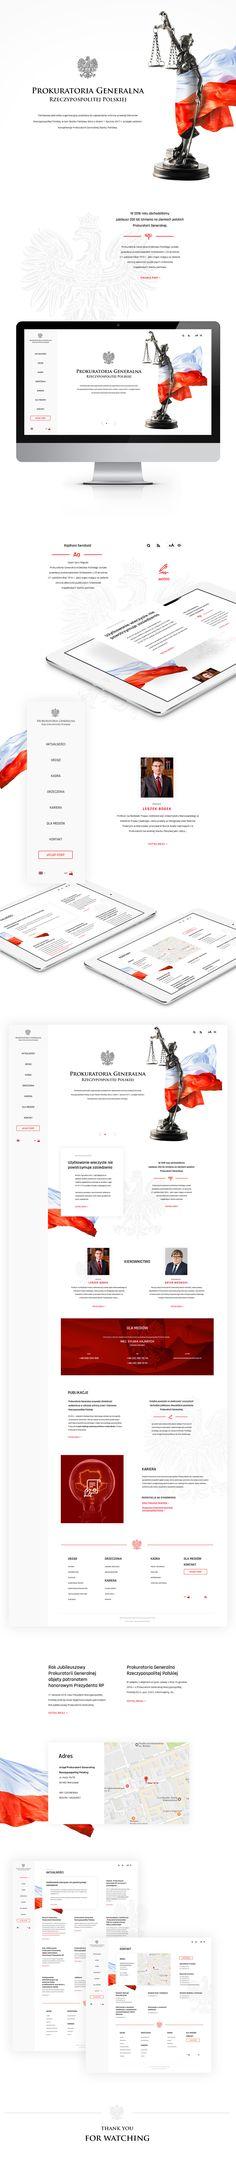 Public Prosecutor of Poland website concept on Behance